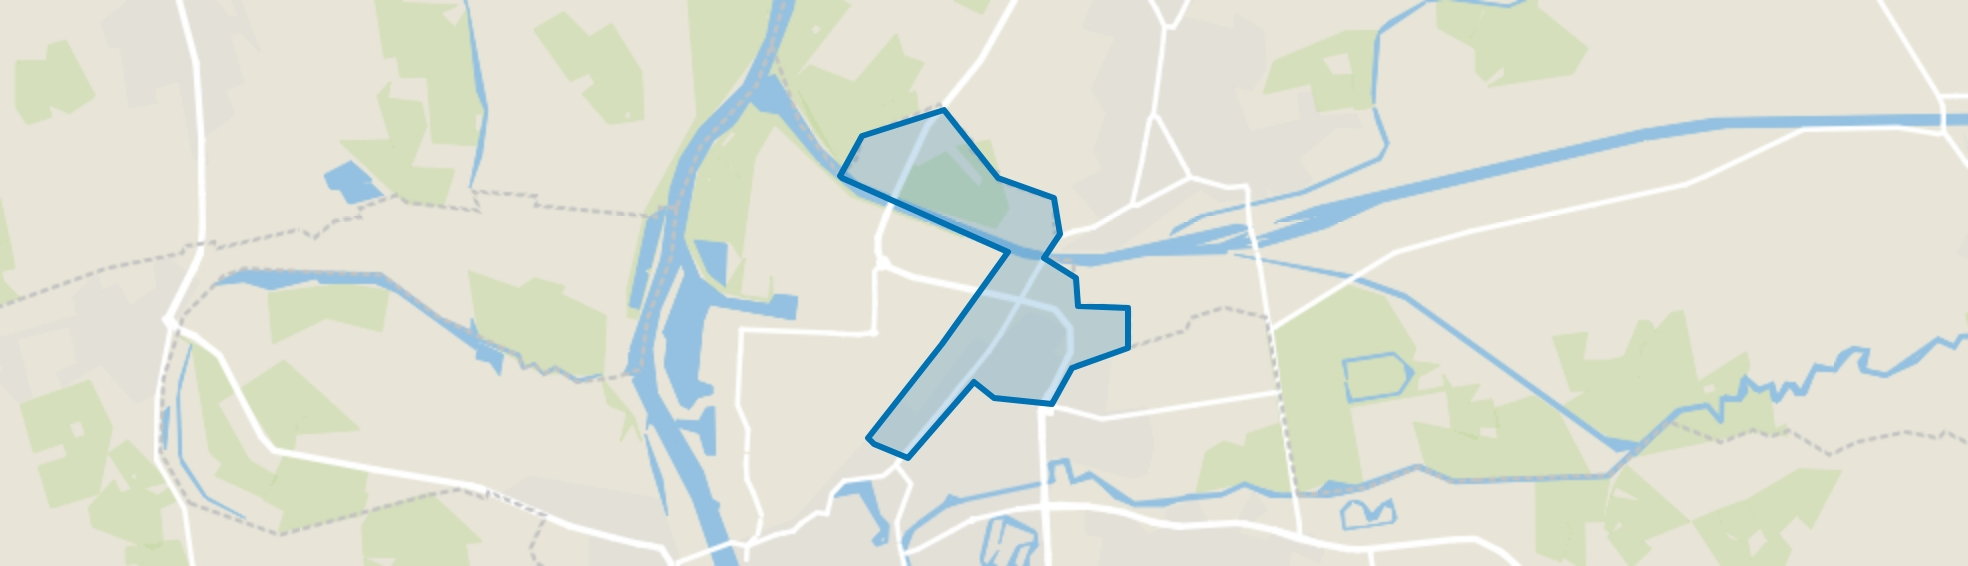 Deventerweg en Polbeek, Zutphen map